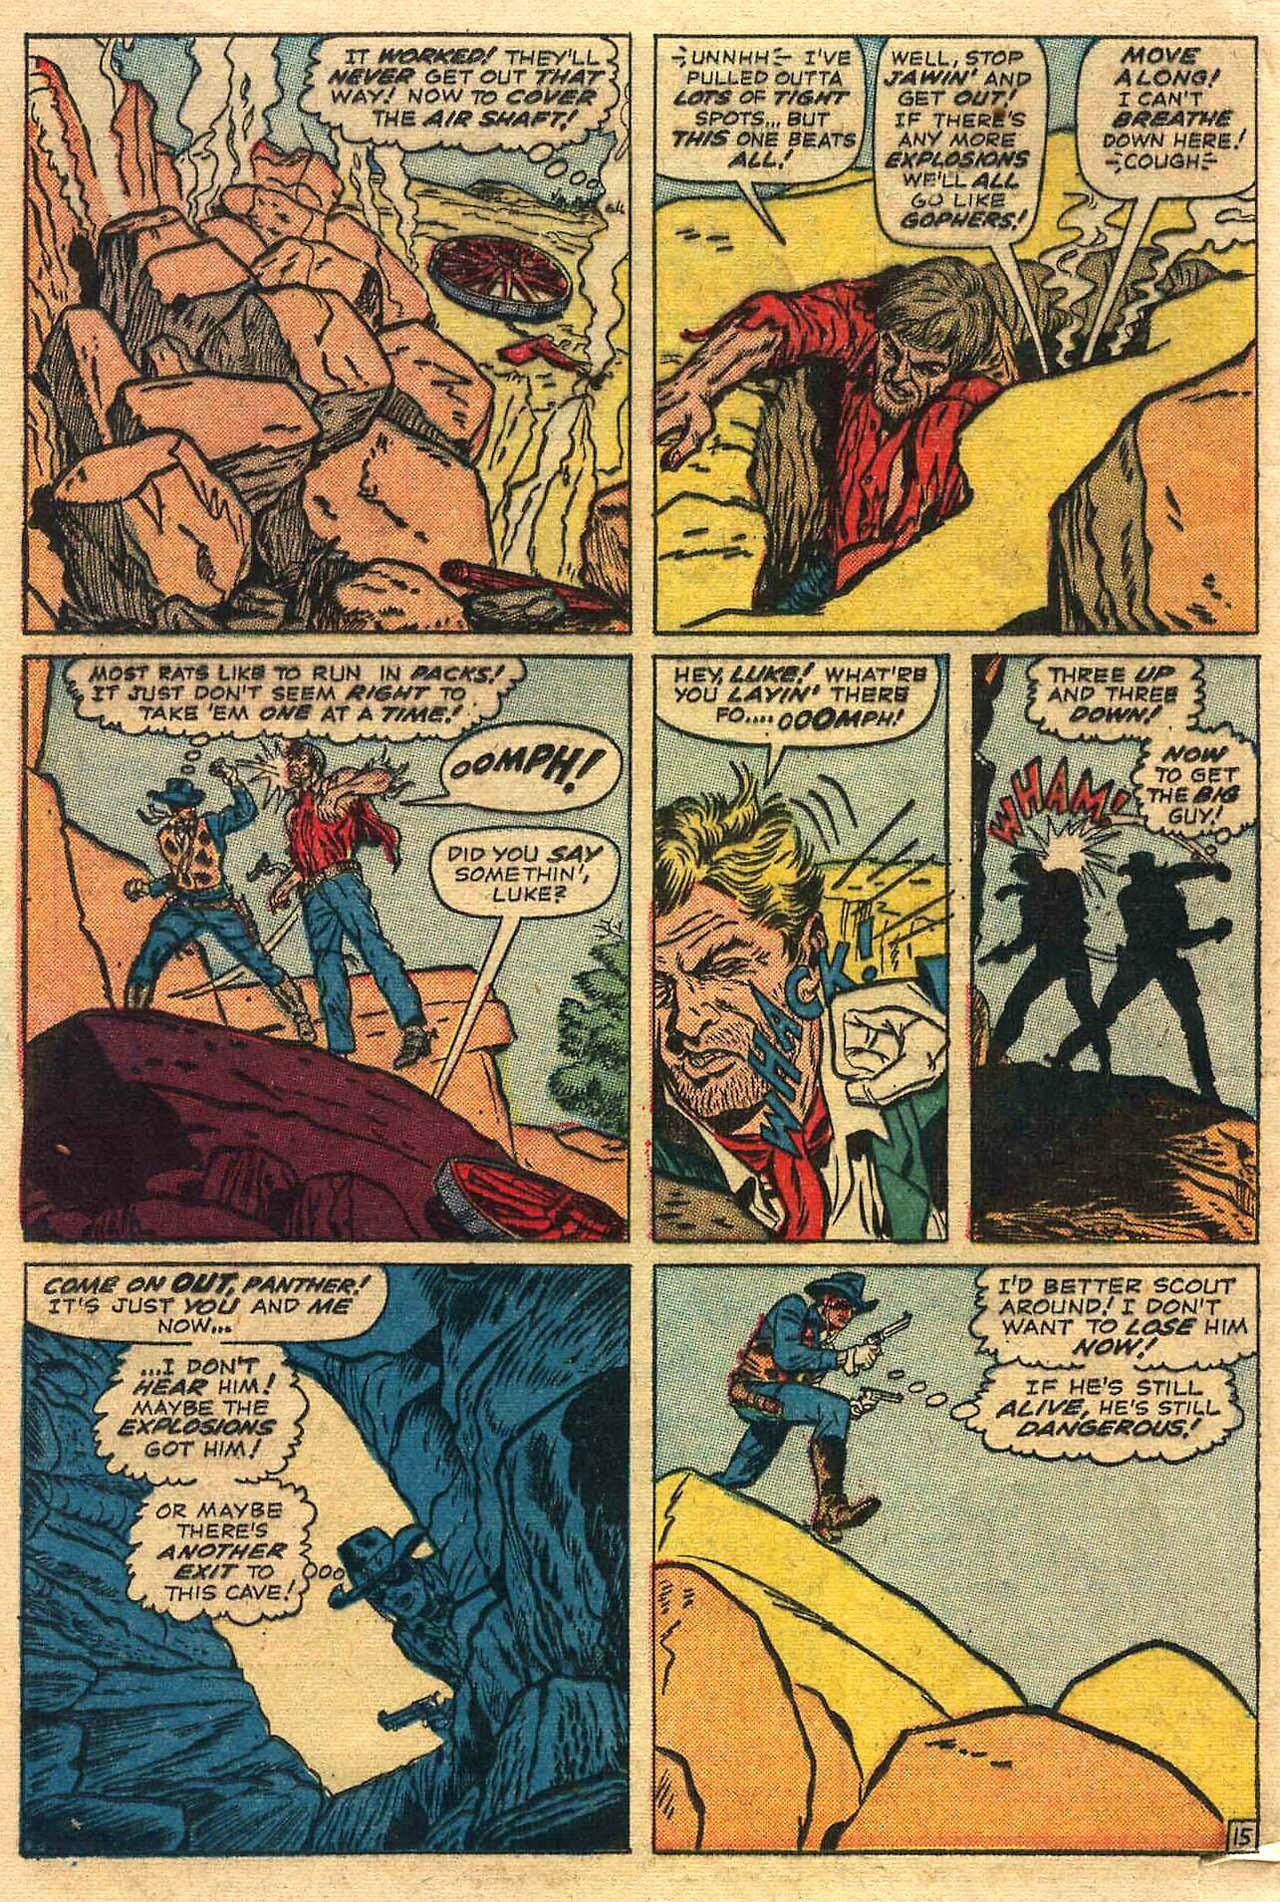 Read online Two-Gun Kid comic -  Issue #77 - 20